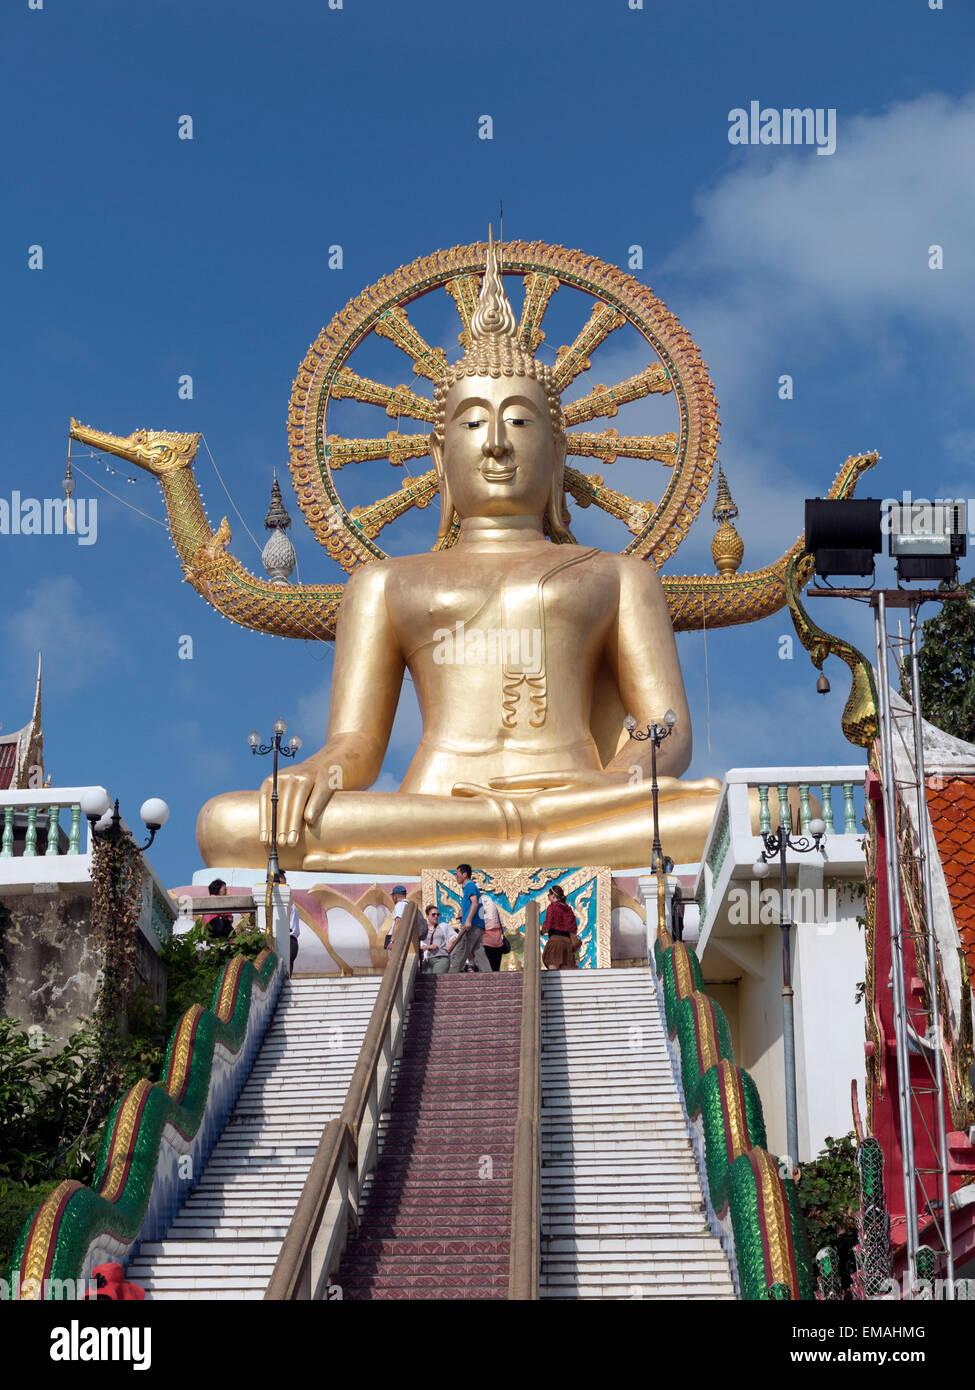 Big Buddha Temple on the Thai island of Koh Samui - Stock Image